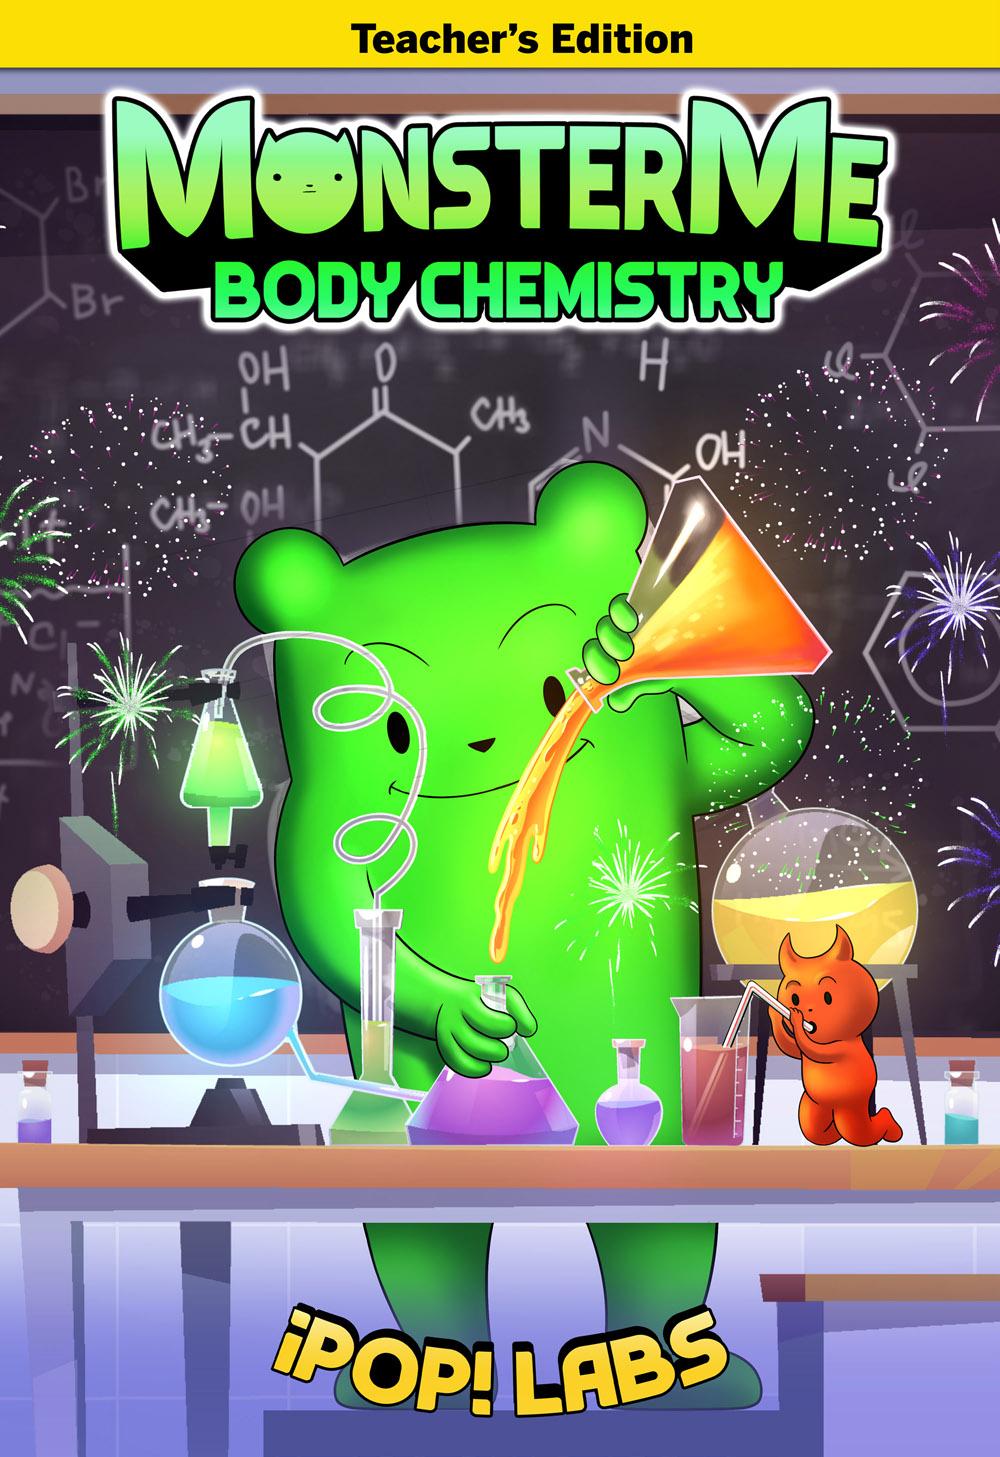 BodyChemistry_Teacher_Page_01